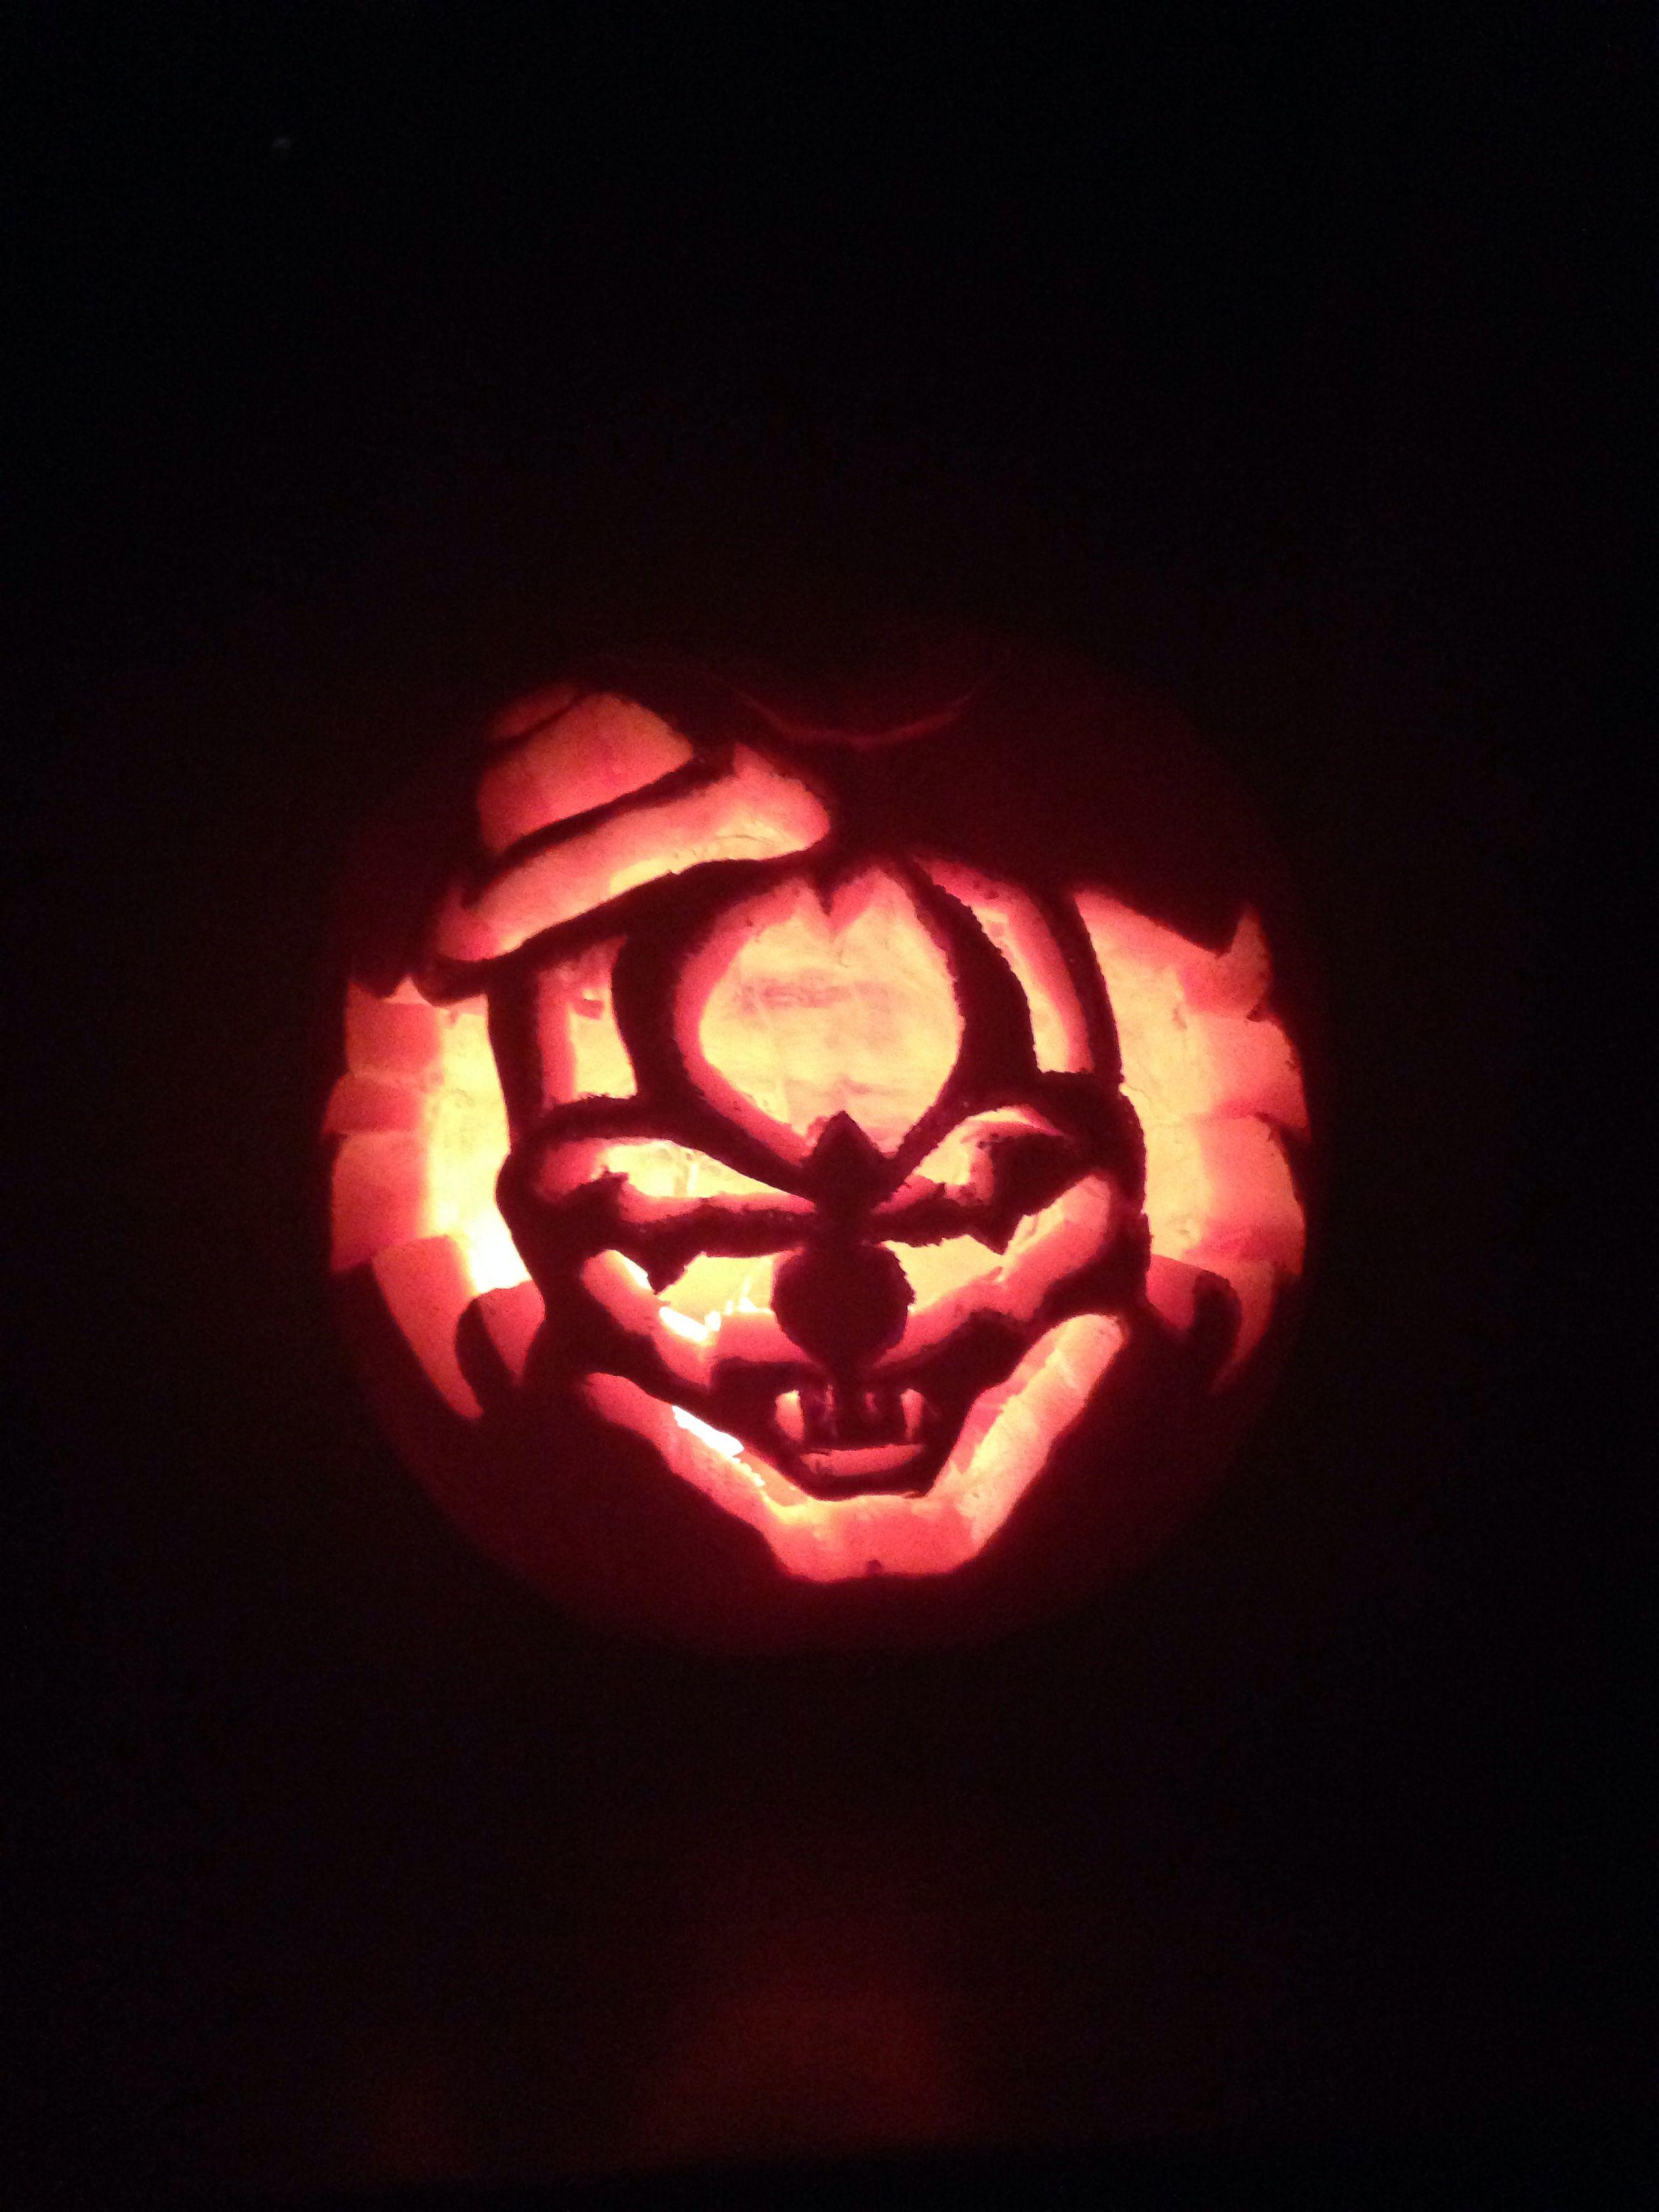 Clown Pumpkin Carving Patterns Simple Design Inspiration